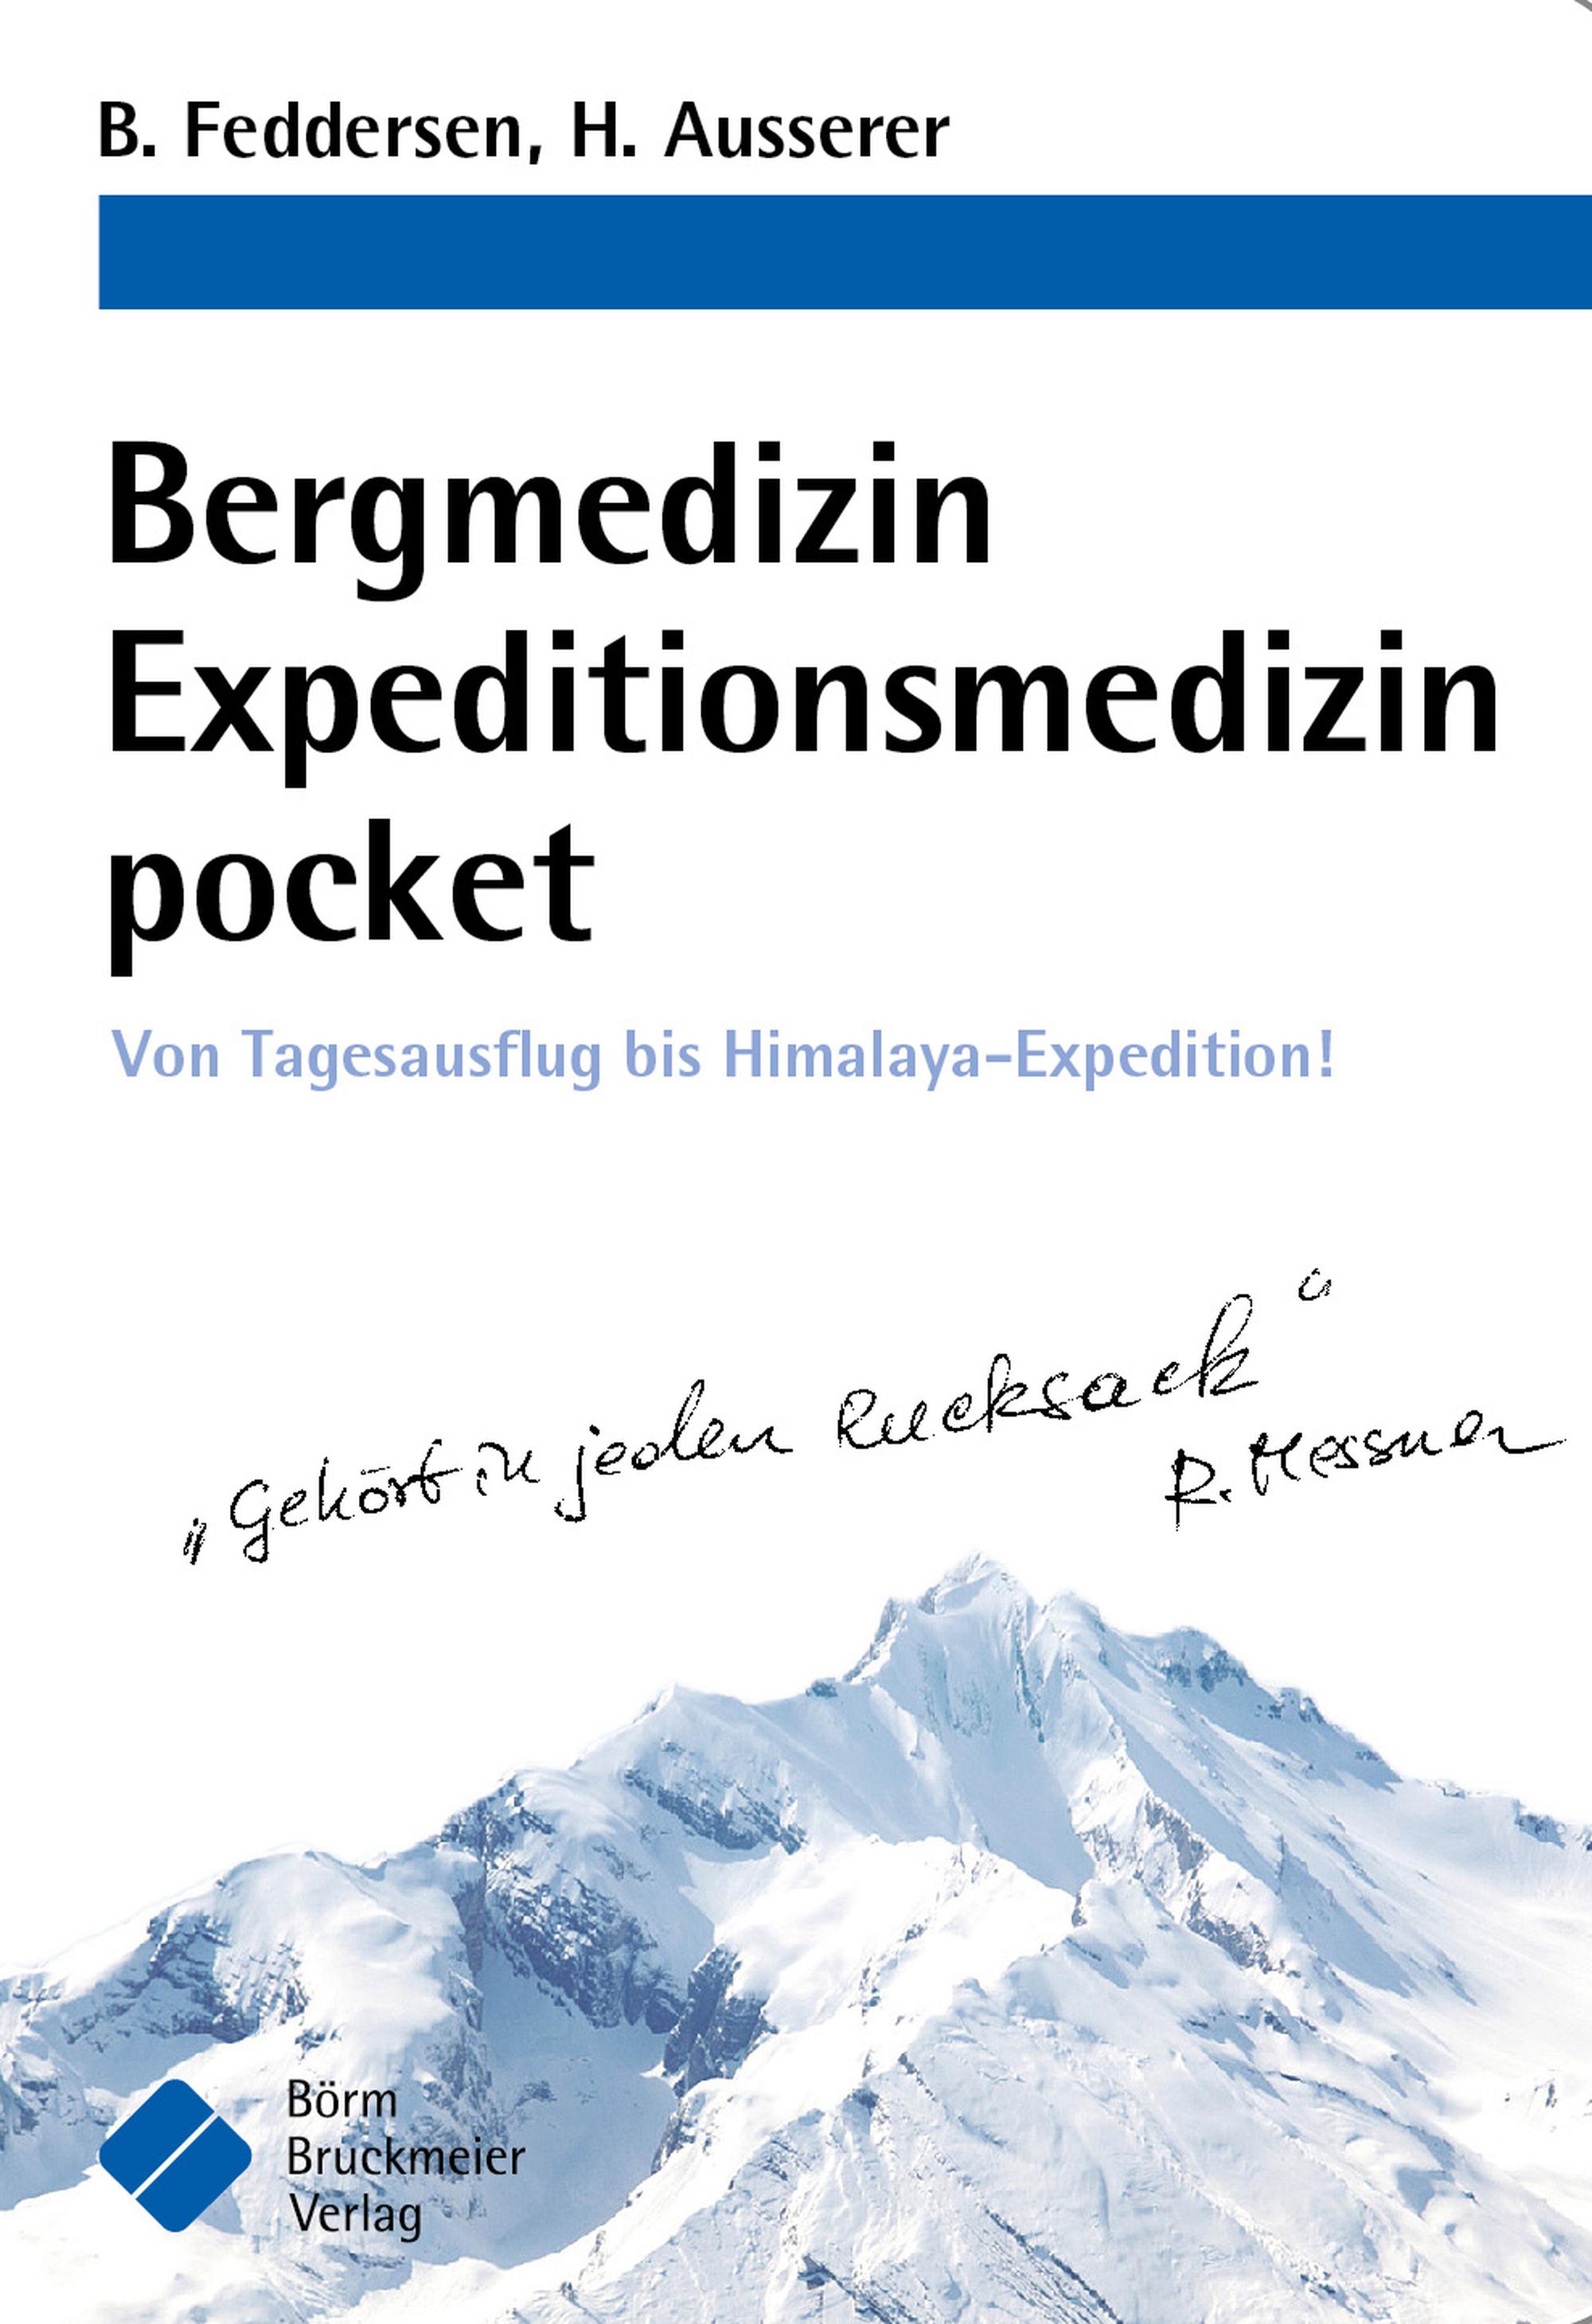 «Bergmedizin Expeditionsmedizin pocket. Von Tagesausflug bis Himalaya-Expedition»